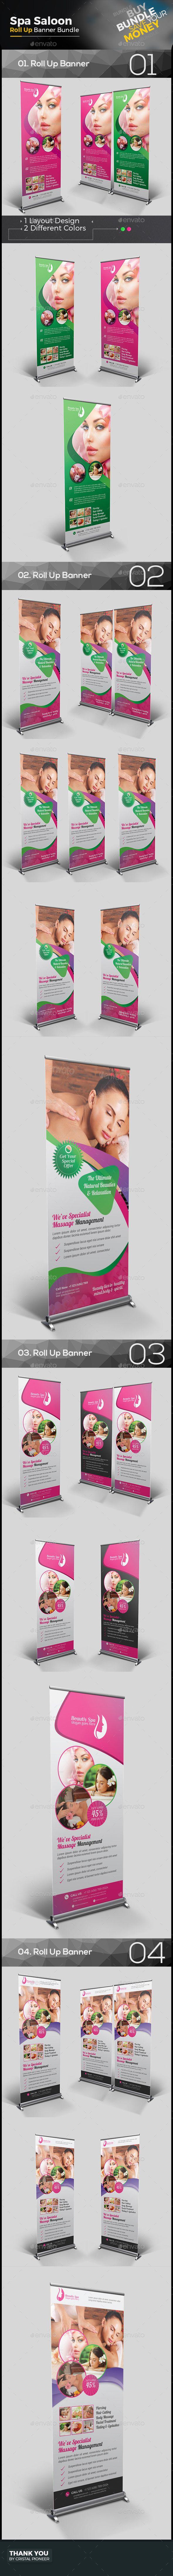 4 Spa Salon Roll-Up Banner Bundle Templates Vector EPS, AI Illustrator. Download...